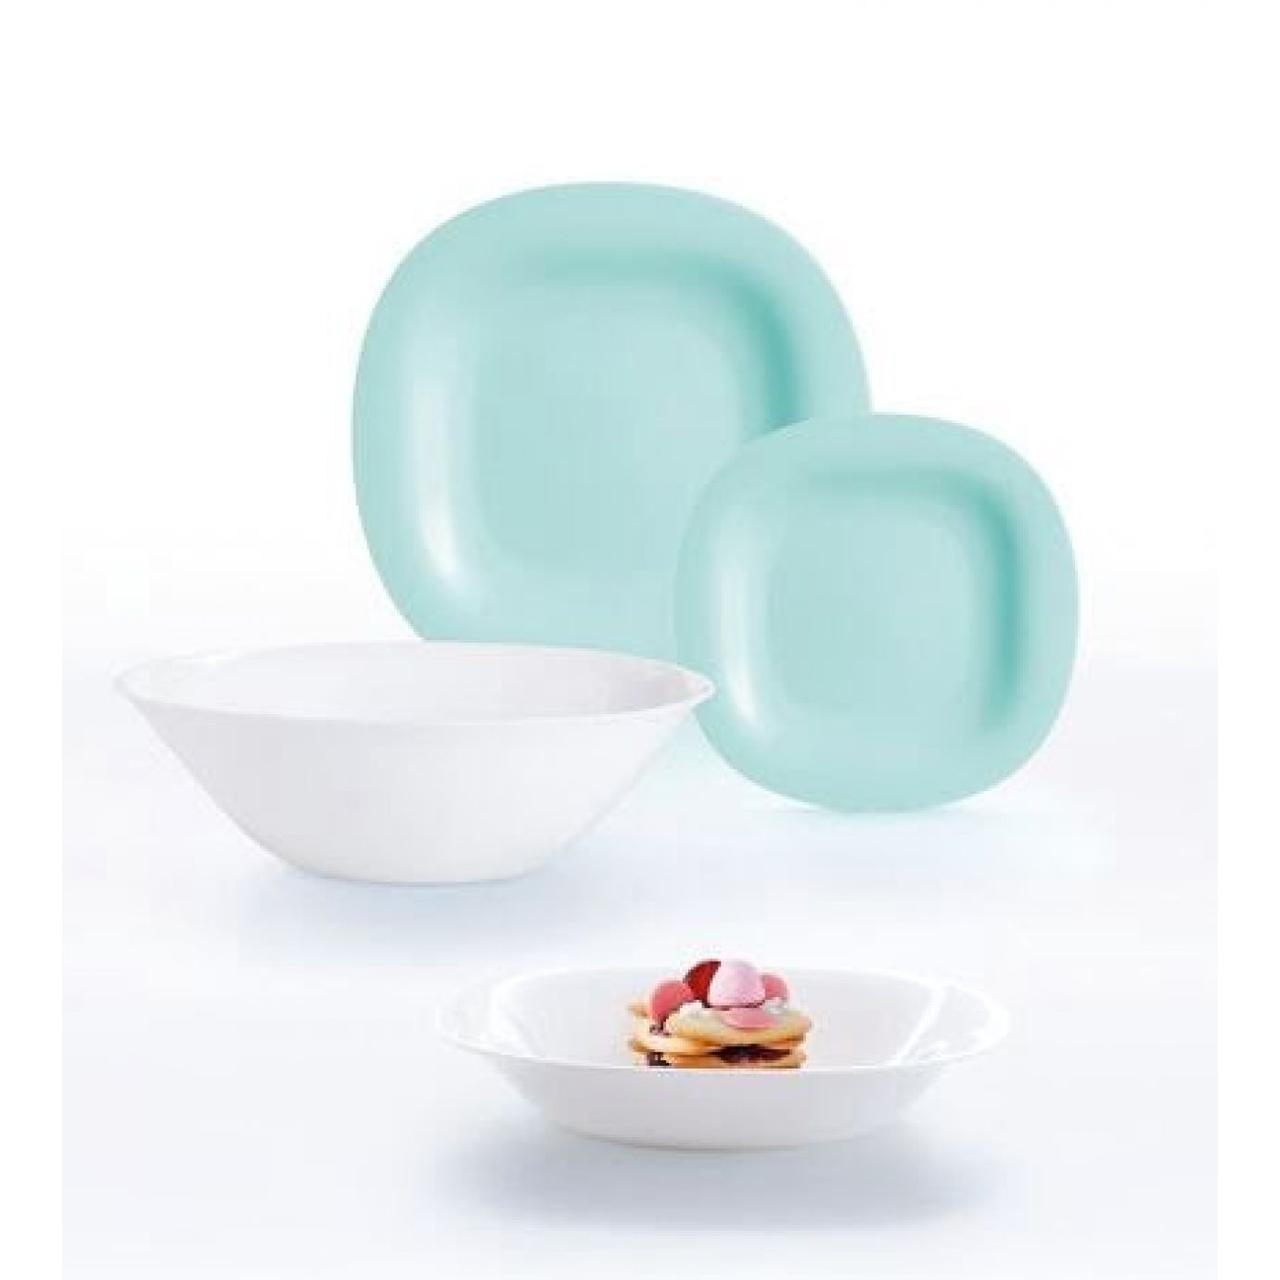 "Сервіз столовий скло 19предм. ""Luminarc.Carine Light Turquoise & White"" №83209/P7627"